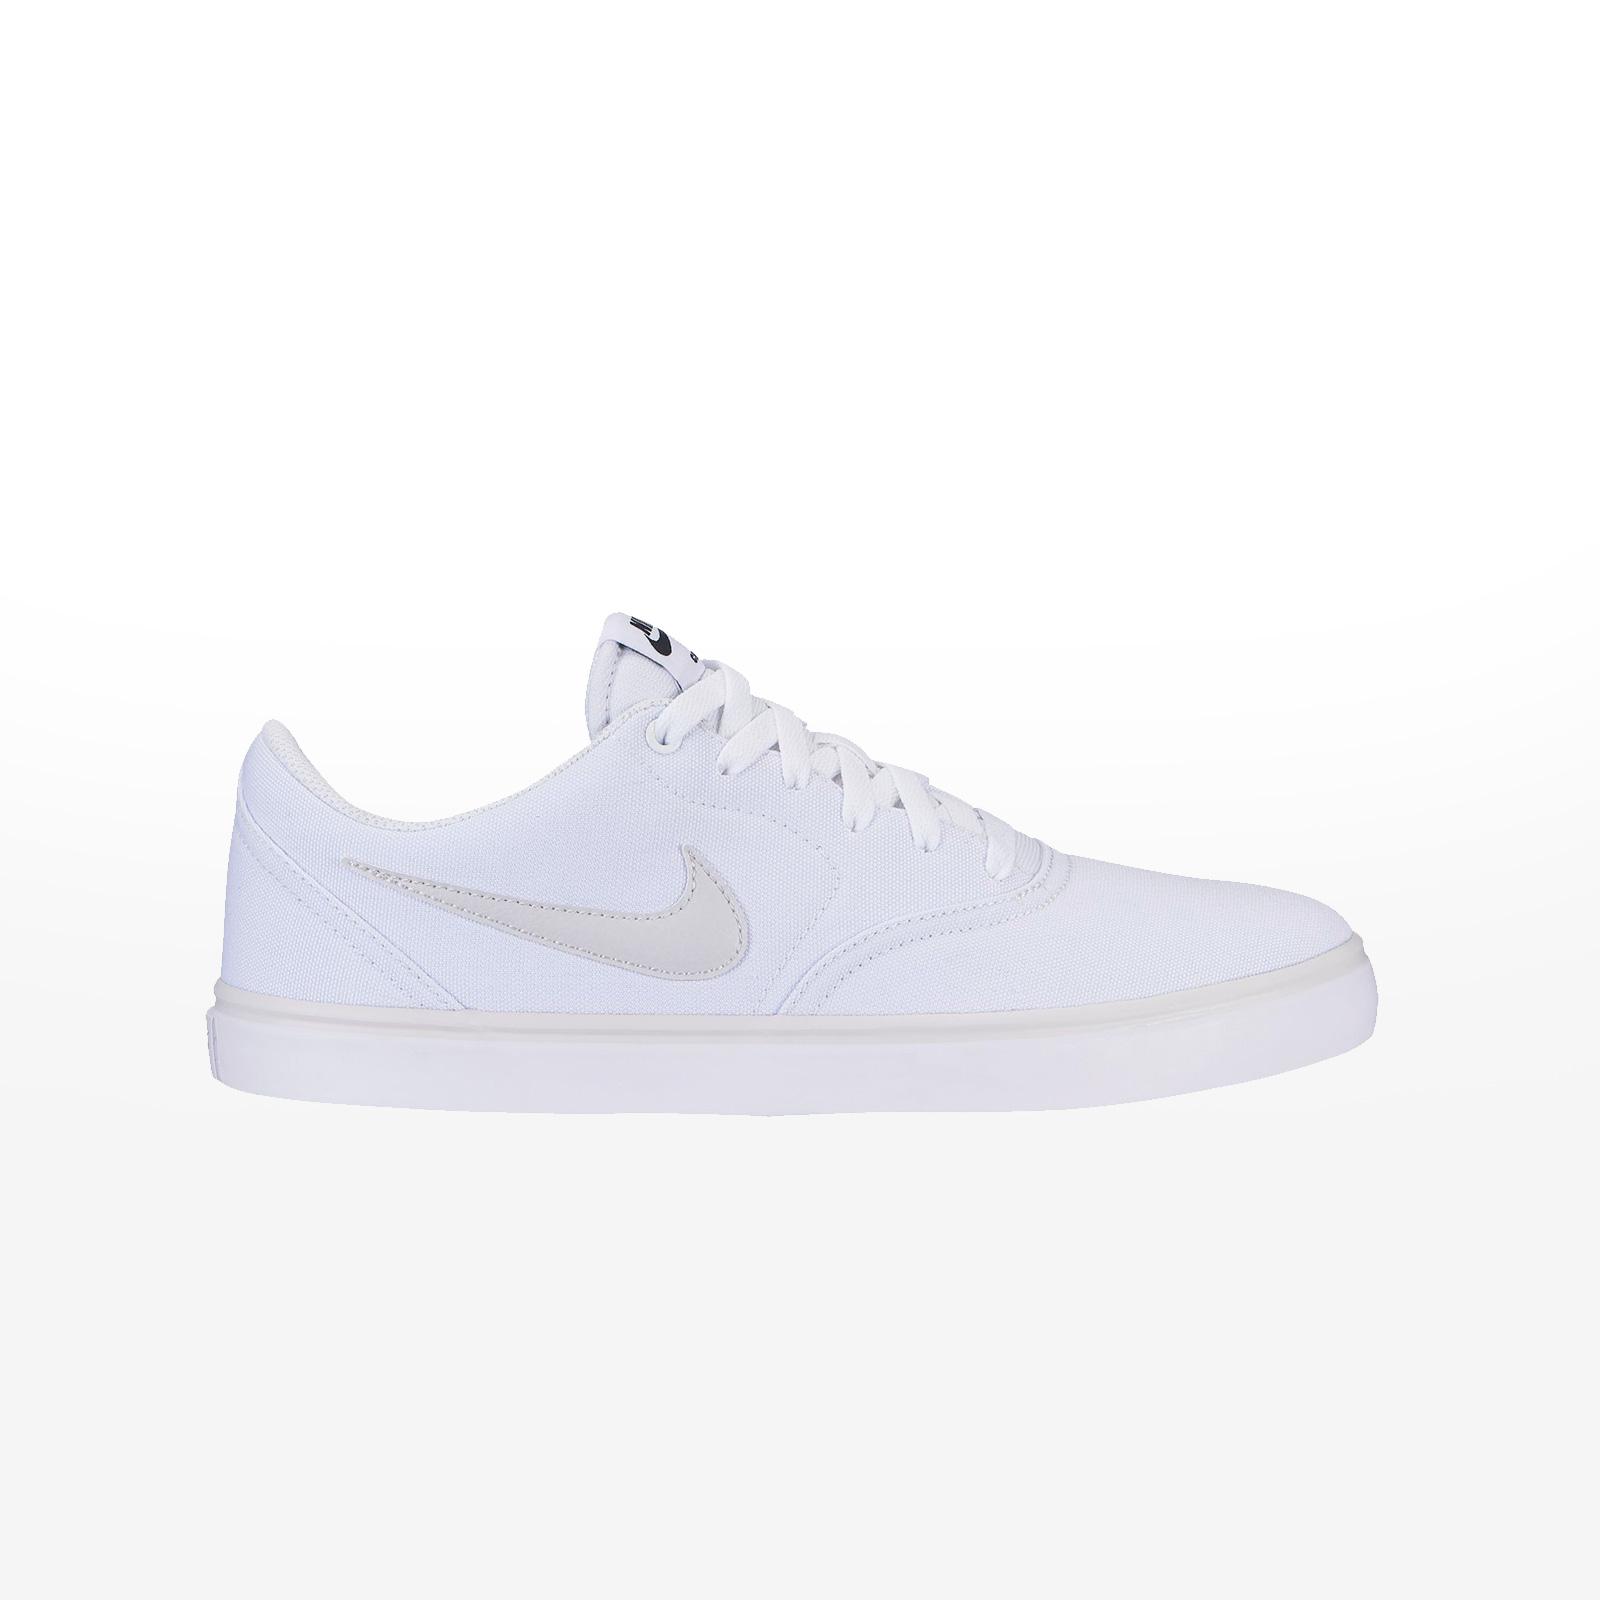 b0a9985e502 Sportcafe Nike – NIKE SB CHECK SOLAR CNVS – WHITE/VAST GREY-WHITE